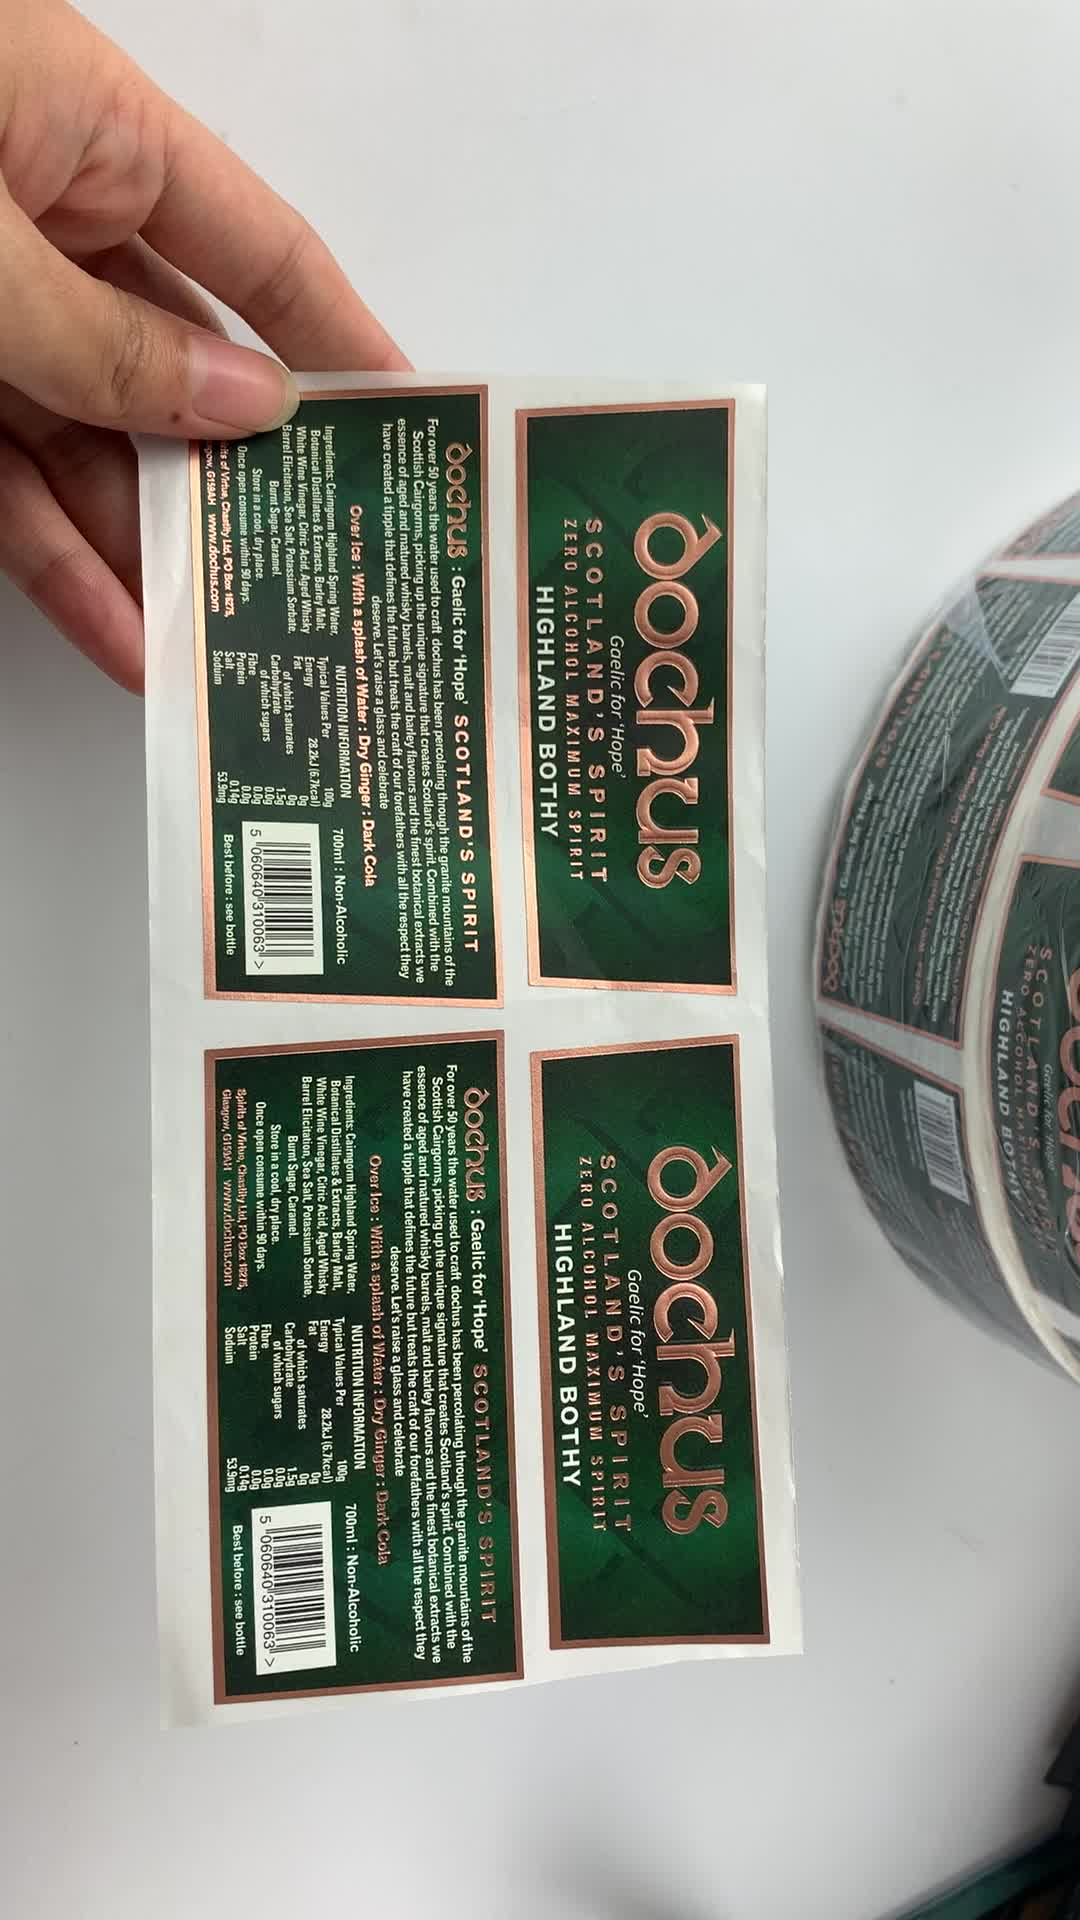 Beste prijs custom adhesive label roll sticker afdrukken, waterdichte logo sticker roll voor gebotteld drank